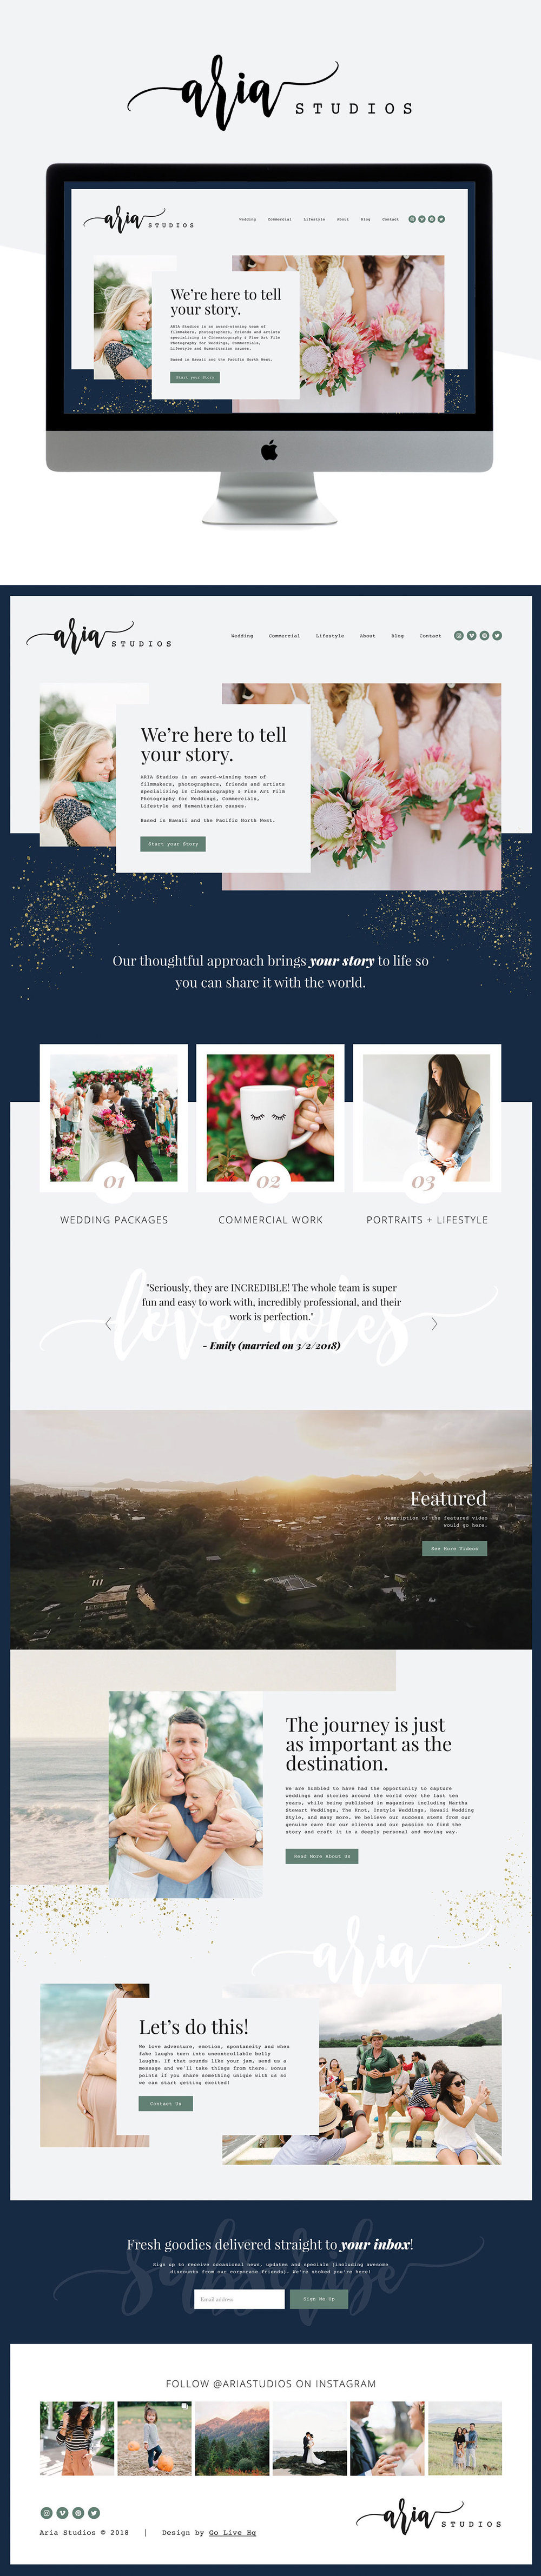 Modern, Lux Website Design for Photography & Film Studio | Design by Go Live HQ